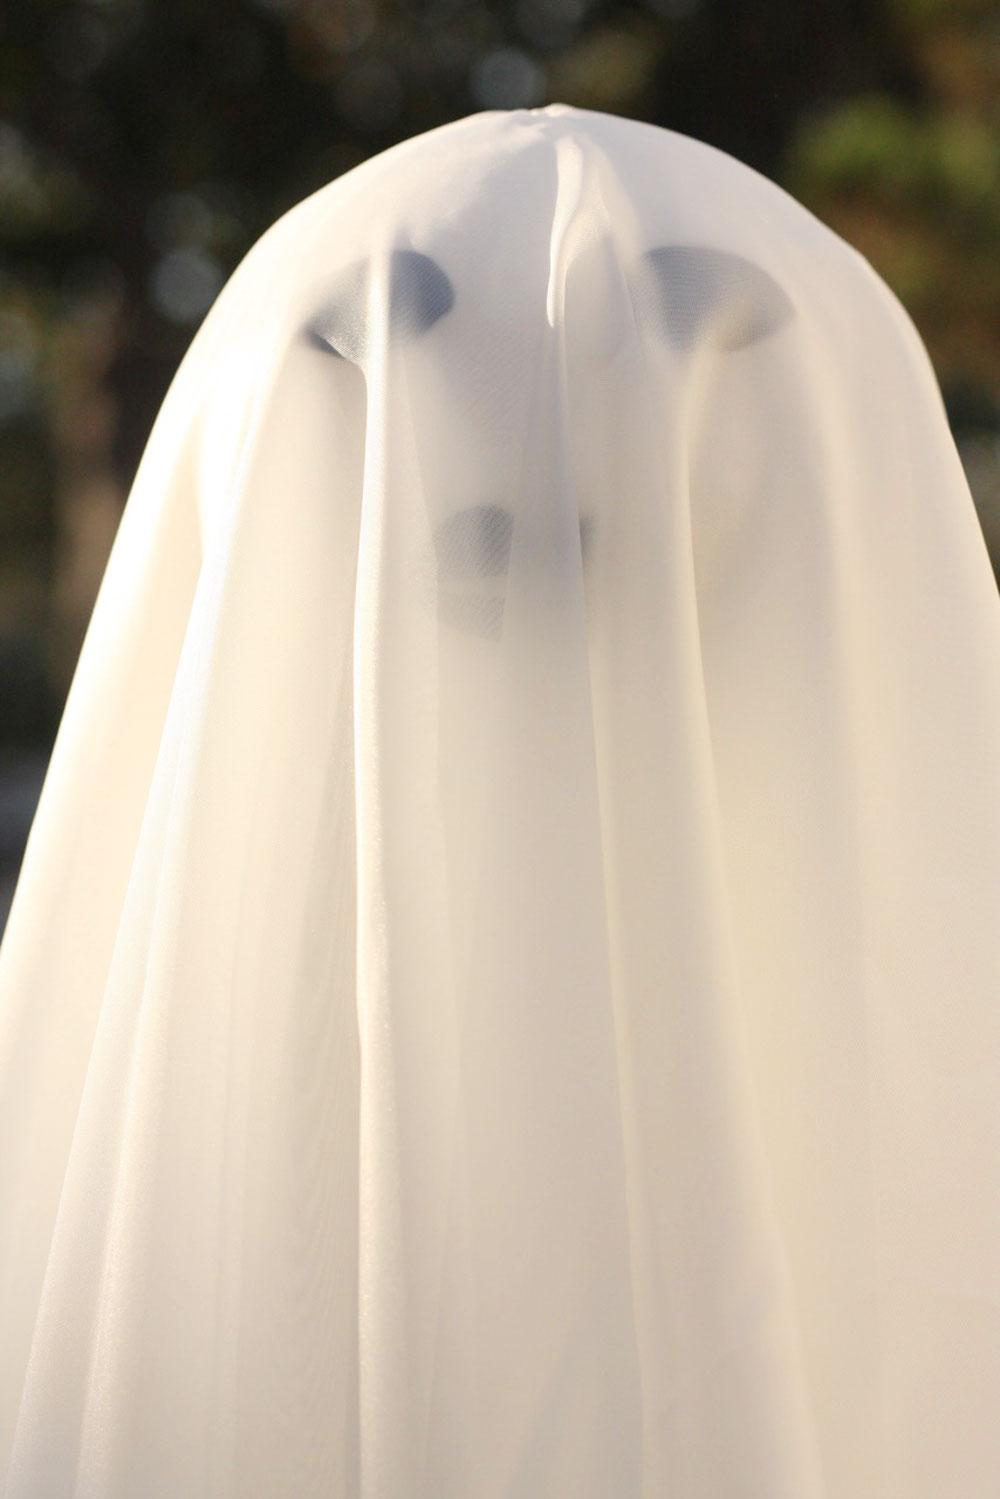 jestcafe.com-ghosts-for-halloween8